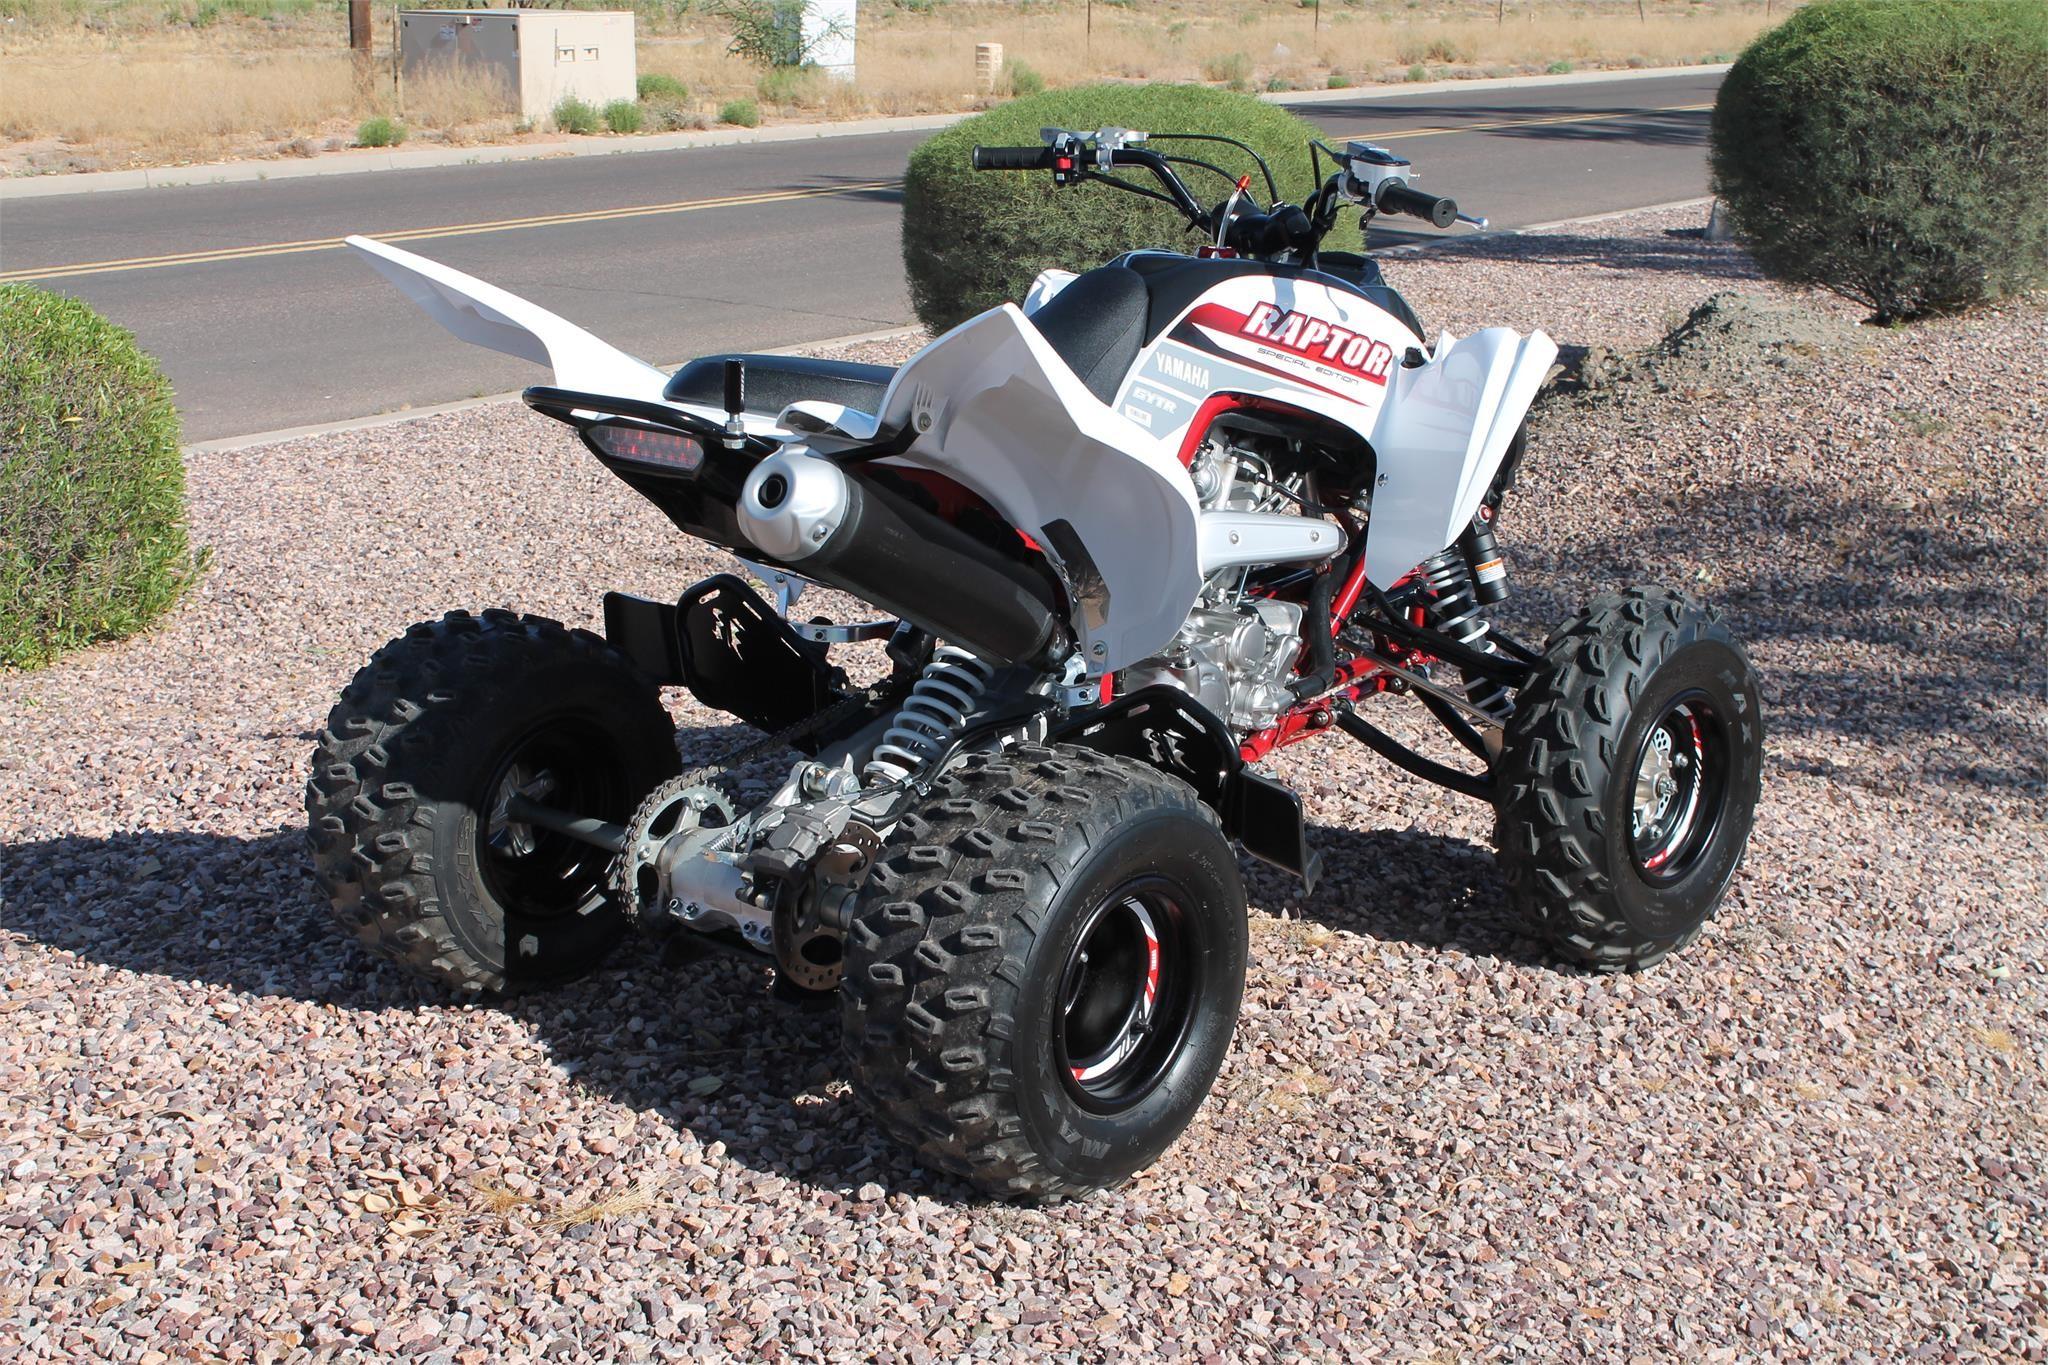 2018 YAMAHA RAPTOR 700R SE For Sale in Casa Grande, Arizona